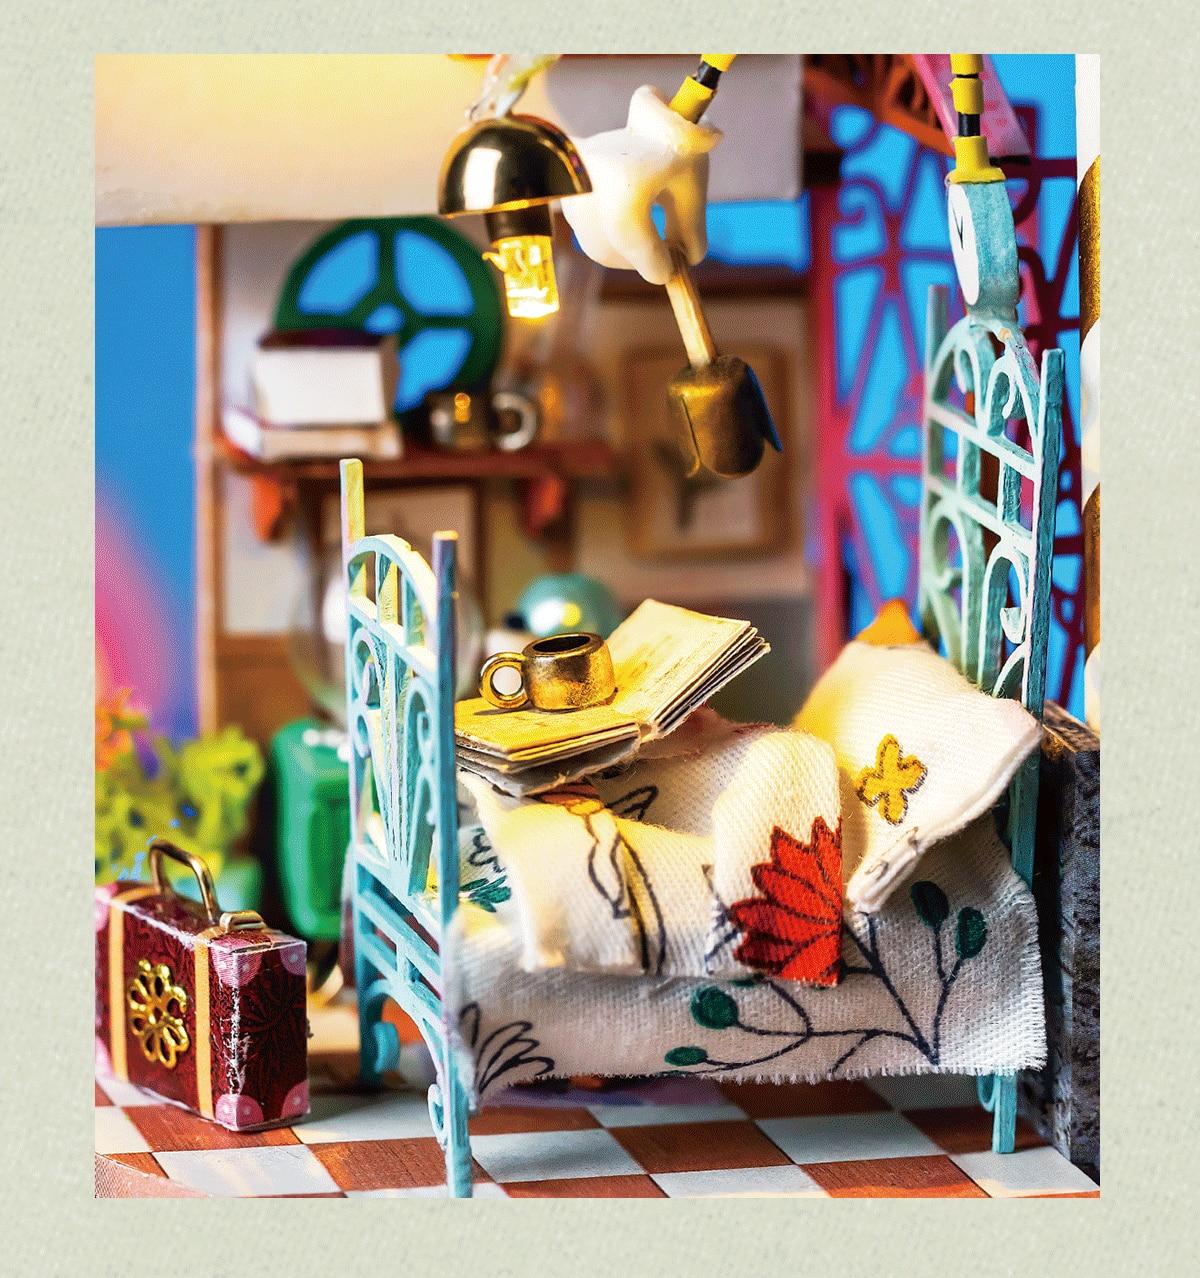 Rolife DIY Miniature Dollhouse - DS001- DS004